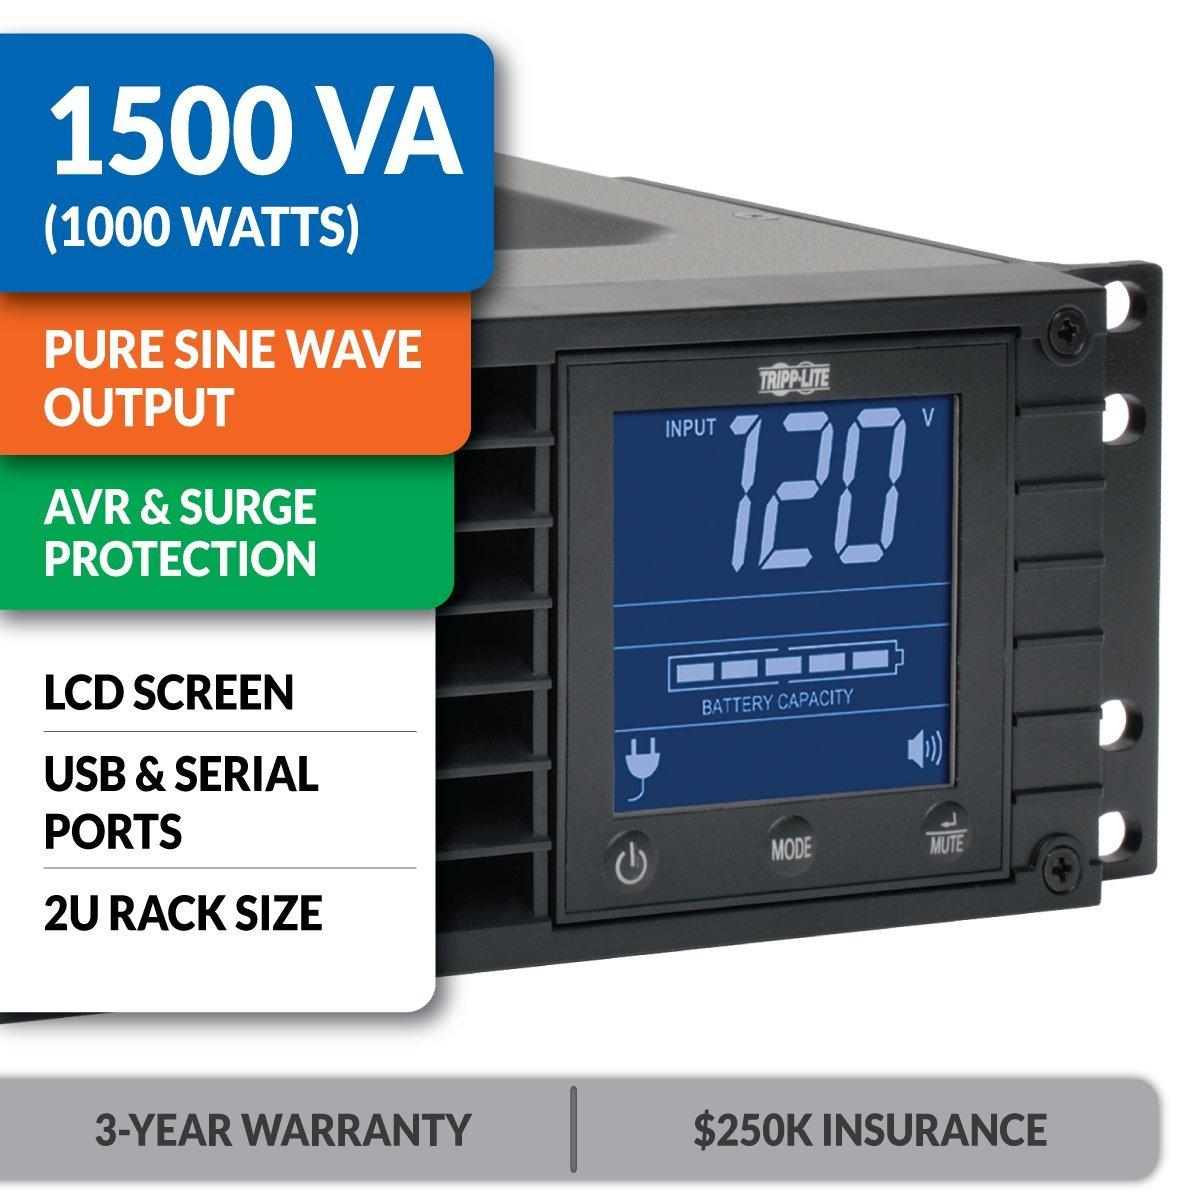 Tripp Lite 1500VA Sine Wave UPS Battery Backup, LCD, 1000W AVR Line-Interactive, 2U Rackmount, USB, DB9, 2 & 3 Year Warranties, 250,000 Insurance (SMC15002URM) by Tripp Lite